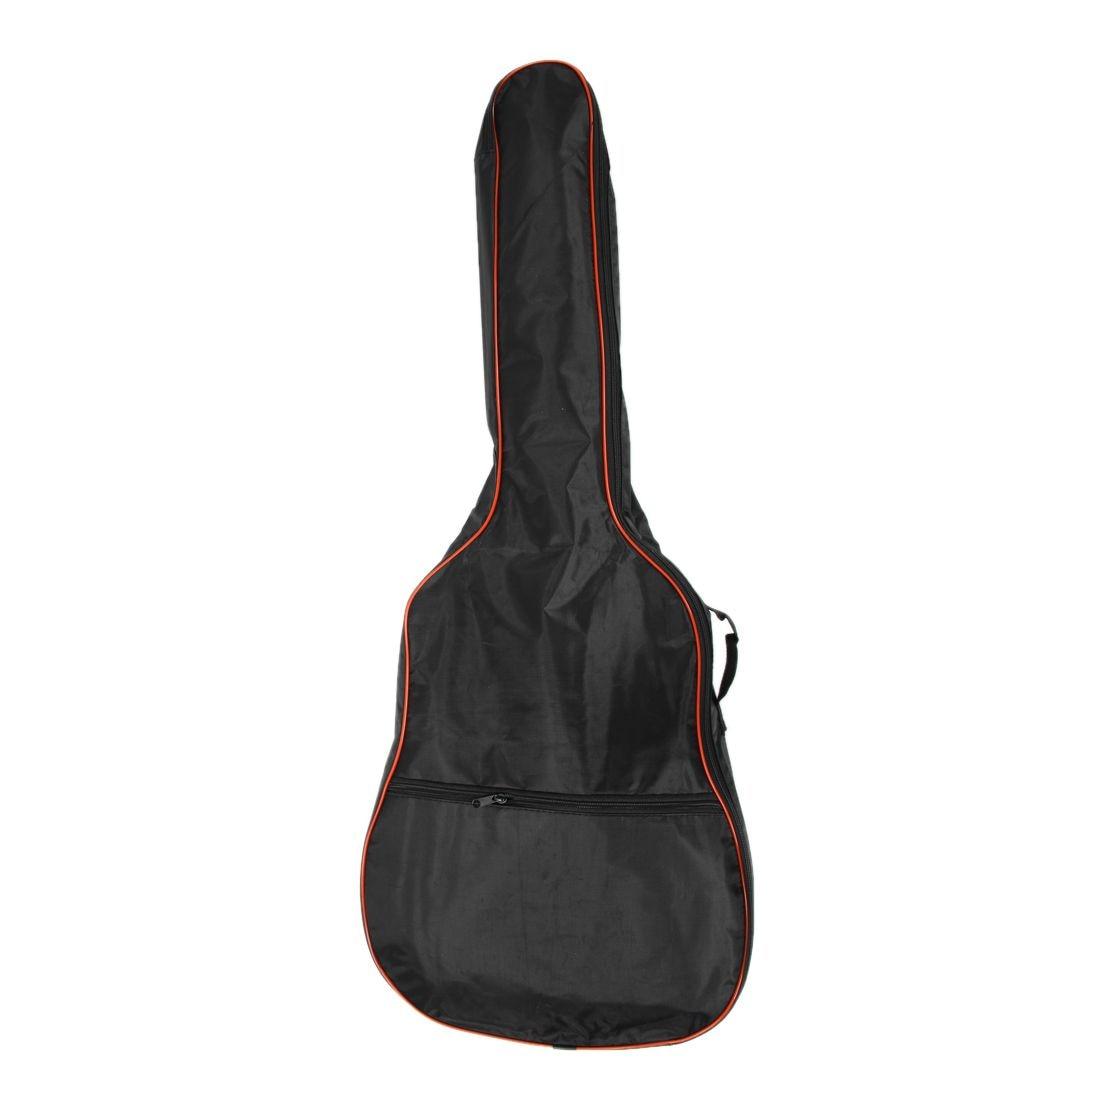 5 pcs of 41 Inch Classical Acoustic Guitar Back Carry Cover Case Bag 5mm Shoulder Straps